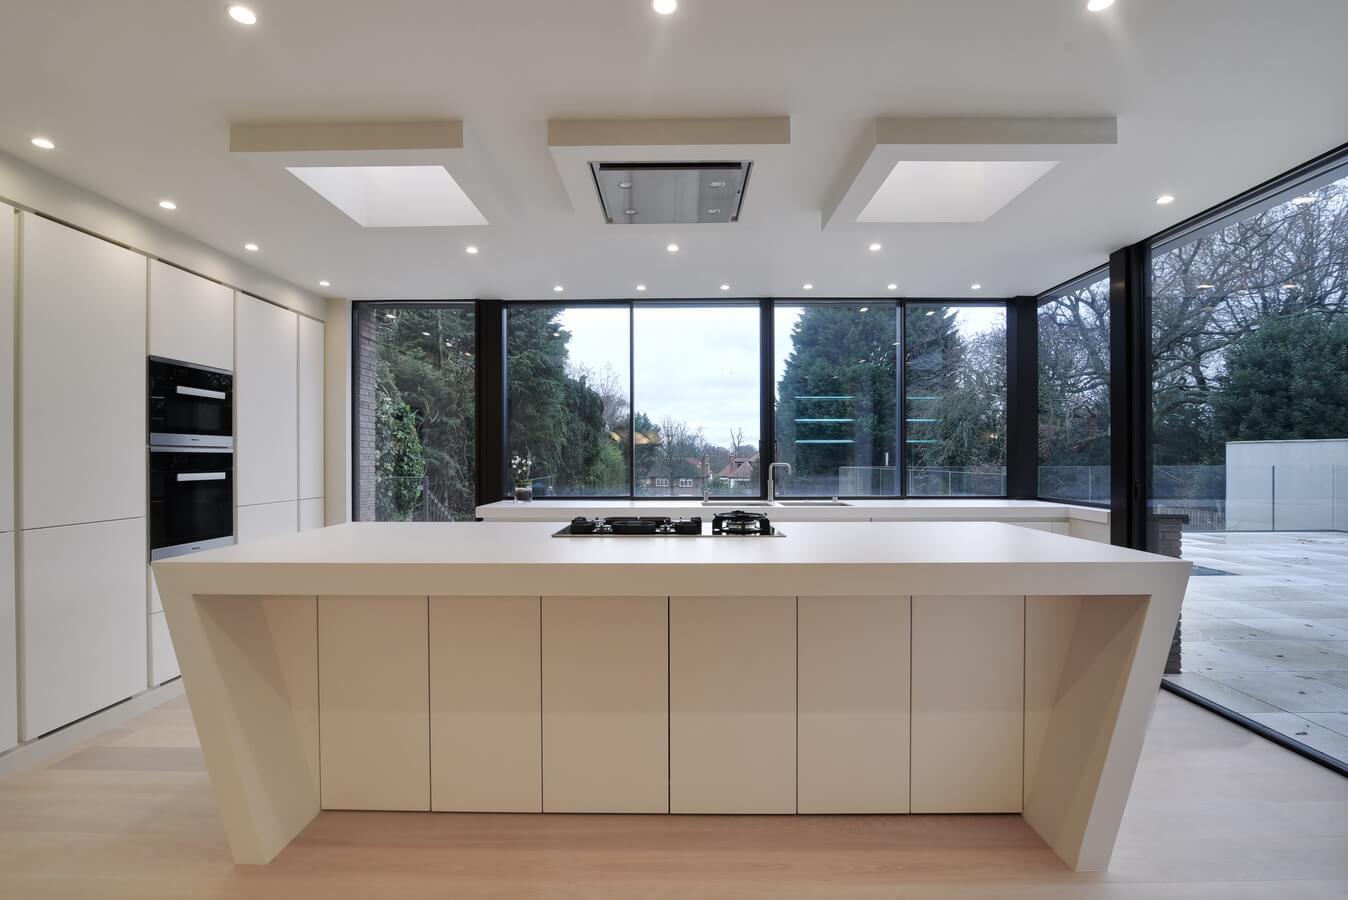 Air-uno-extractor-hood-above-kitchen-island-london.jpg